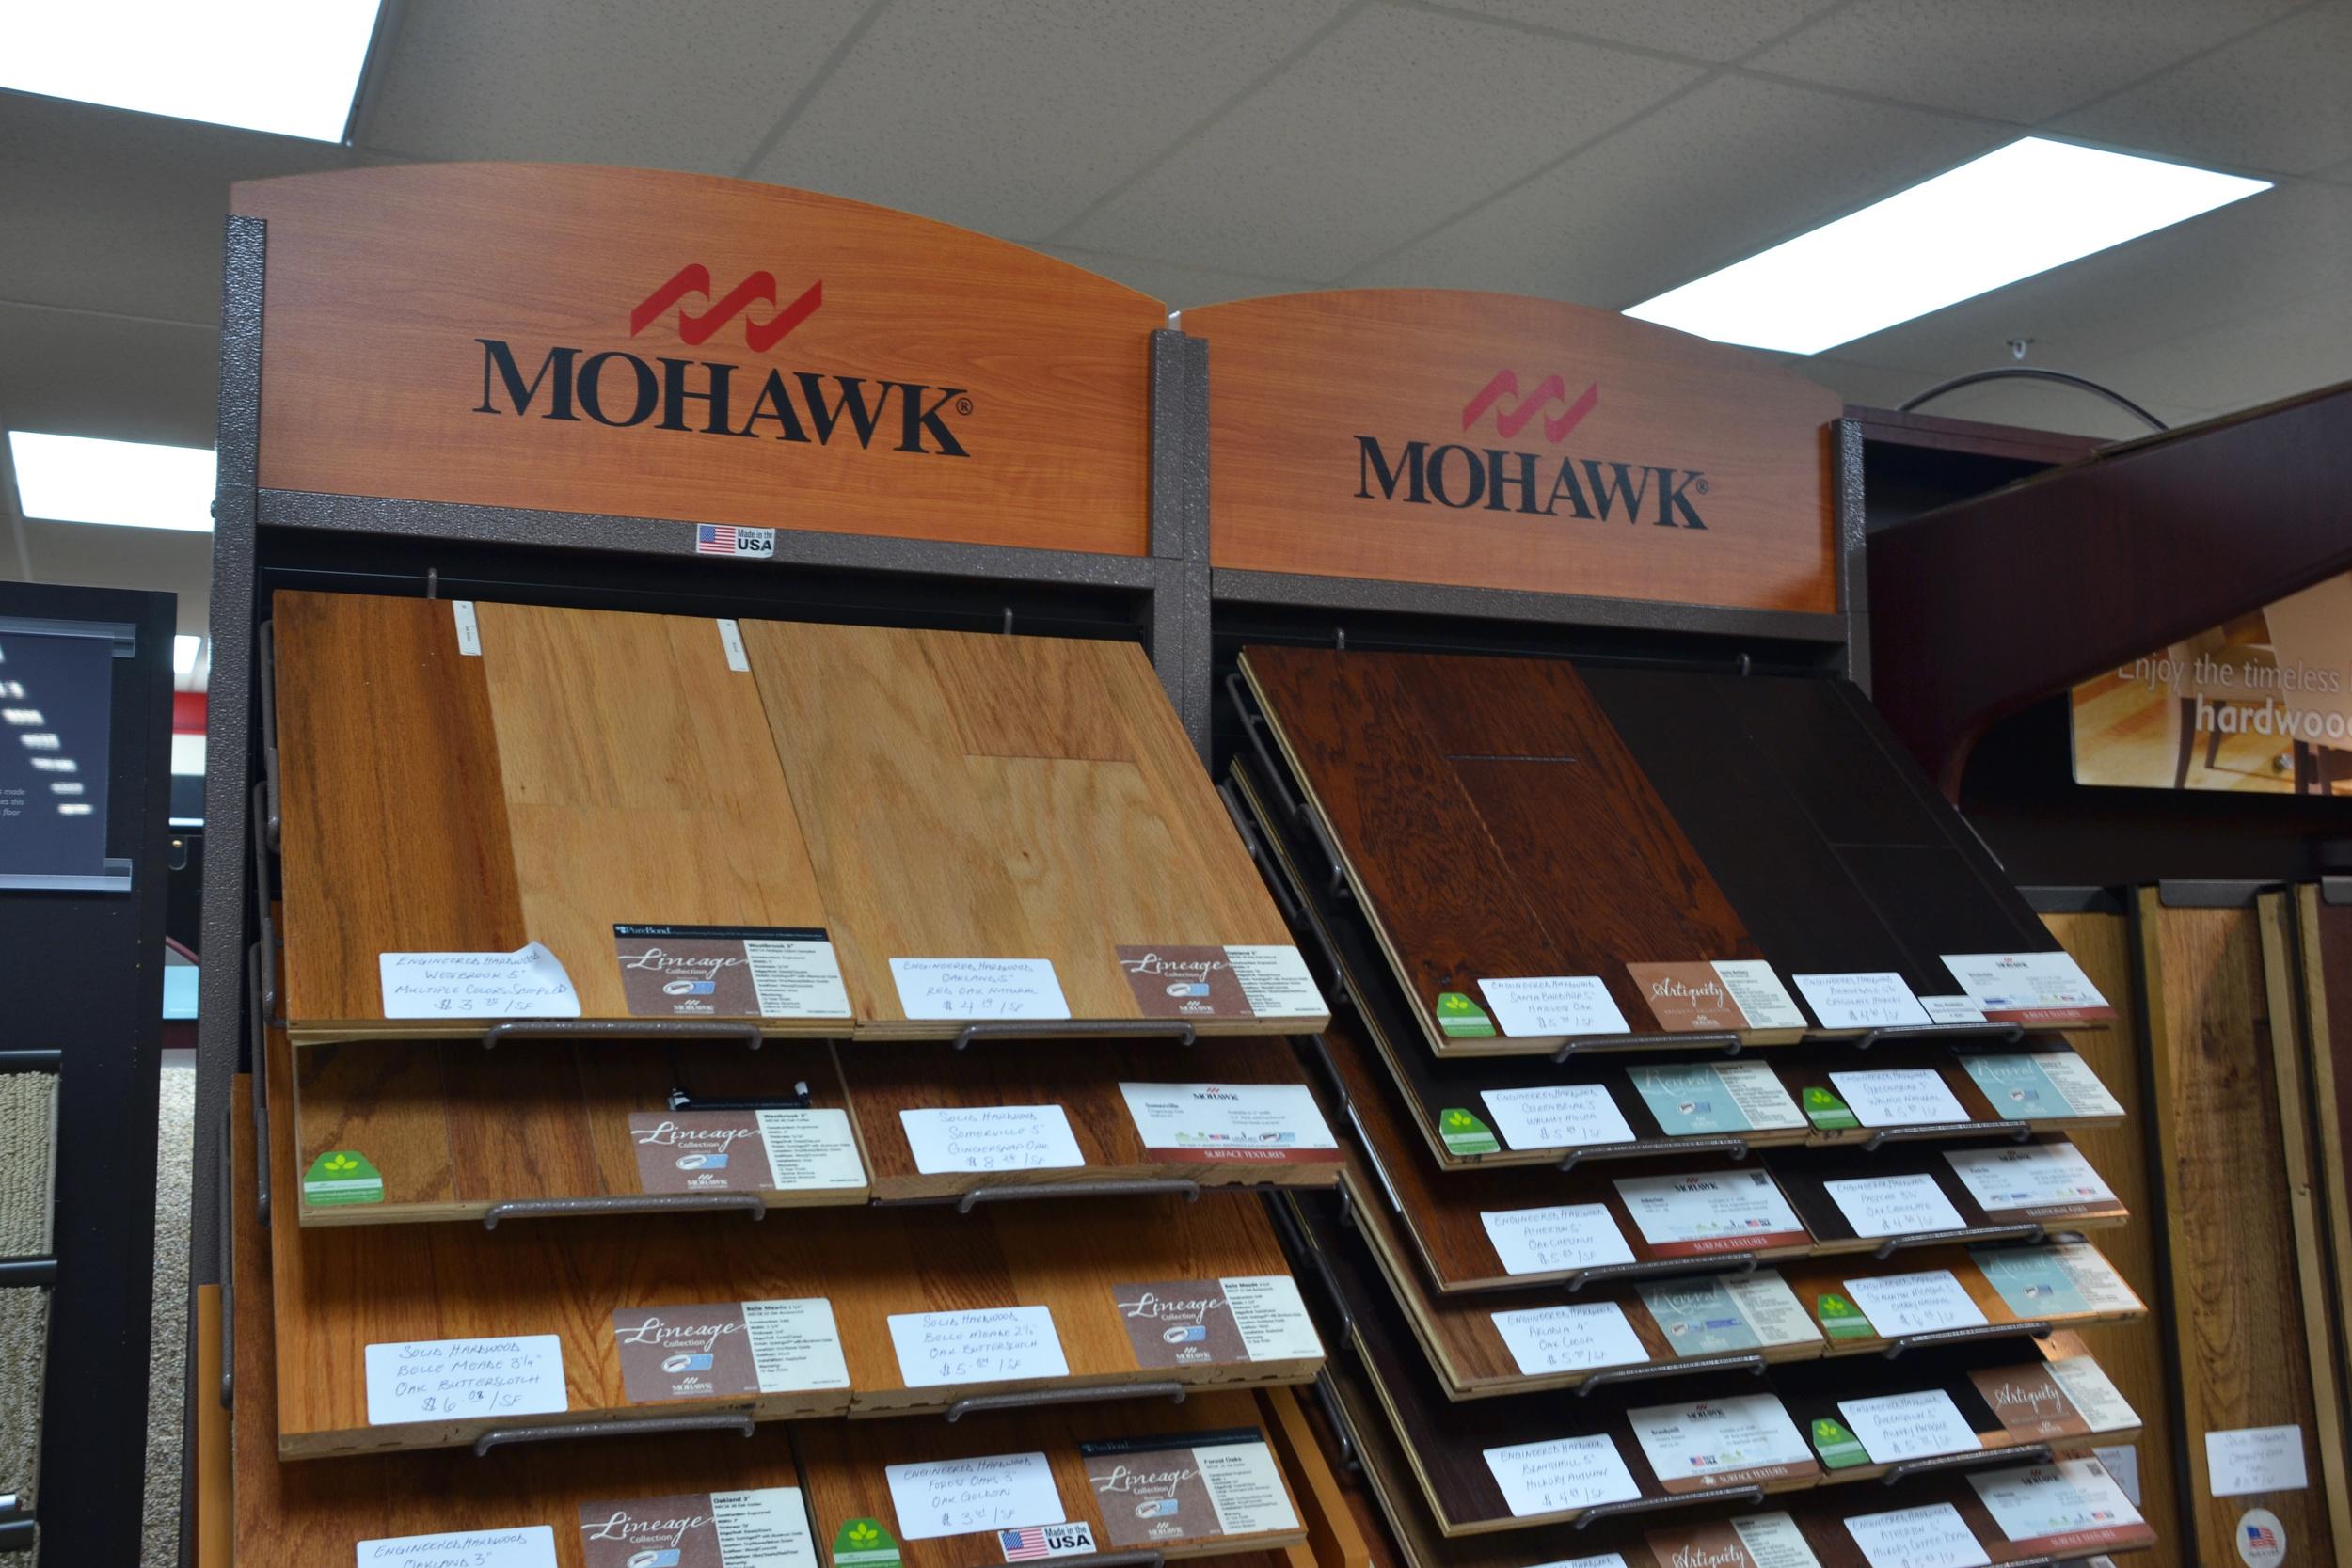 display-mohawk-wood.jpg